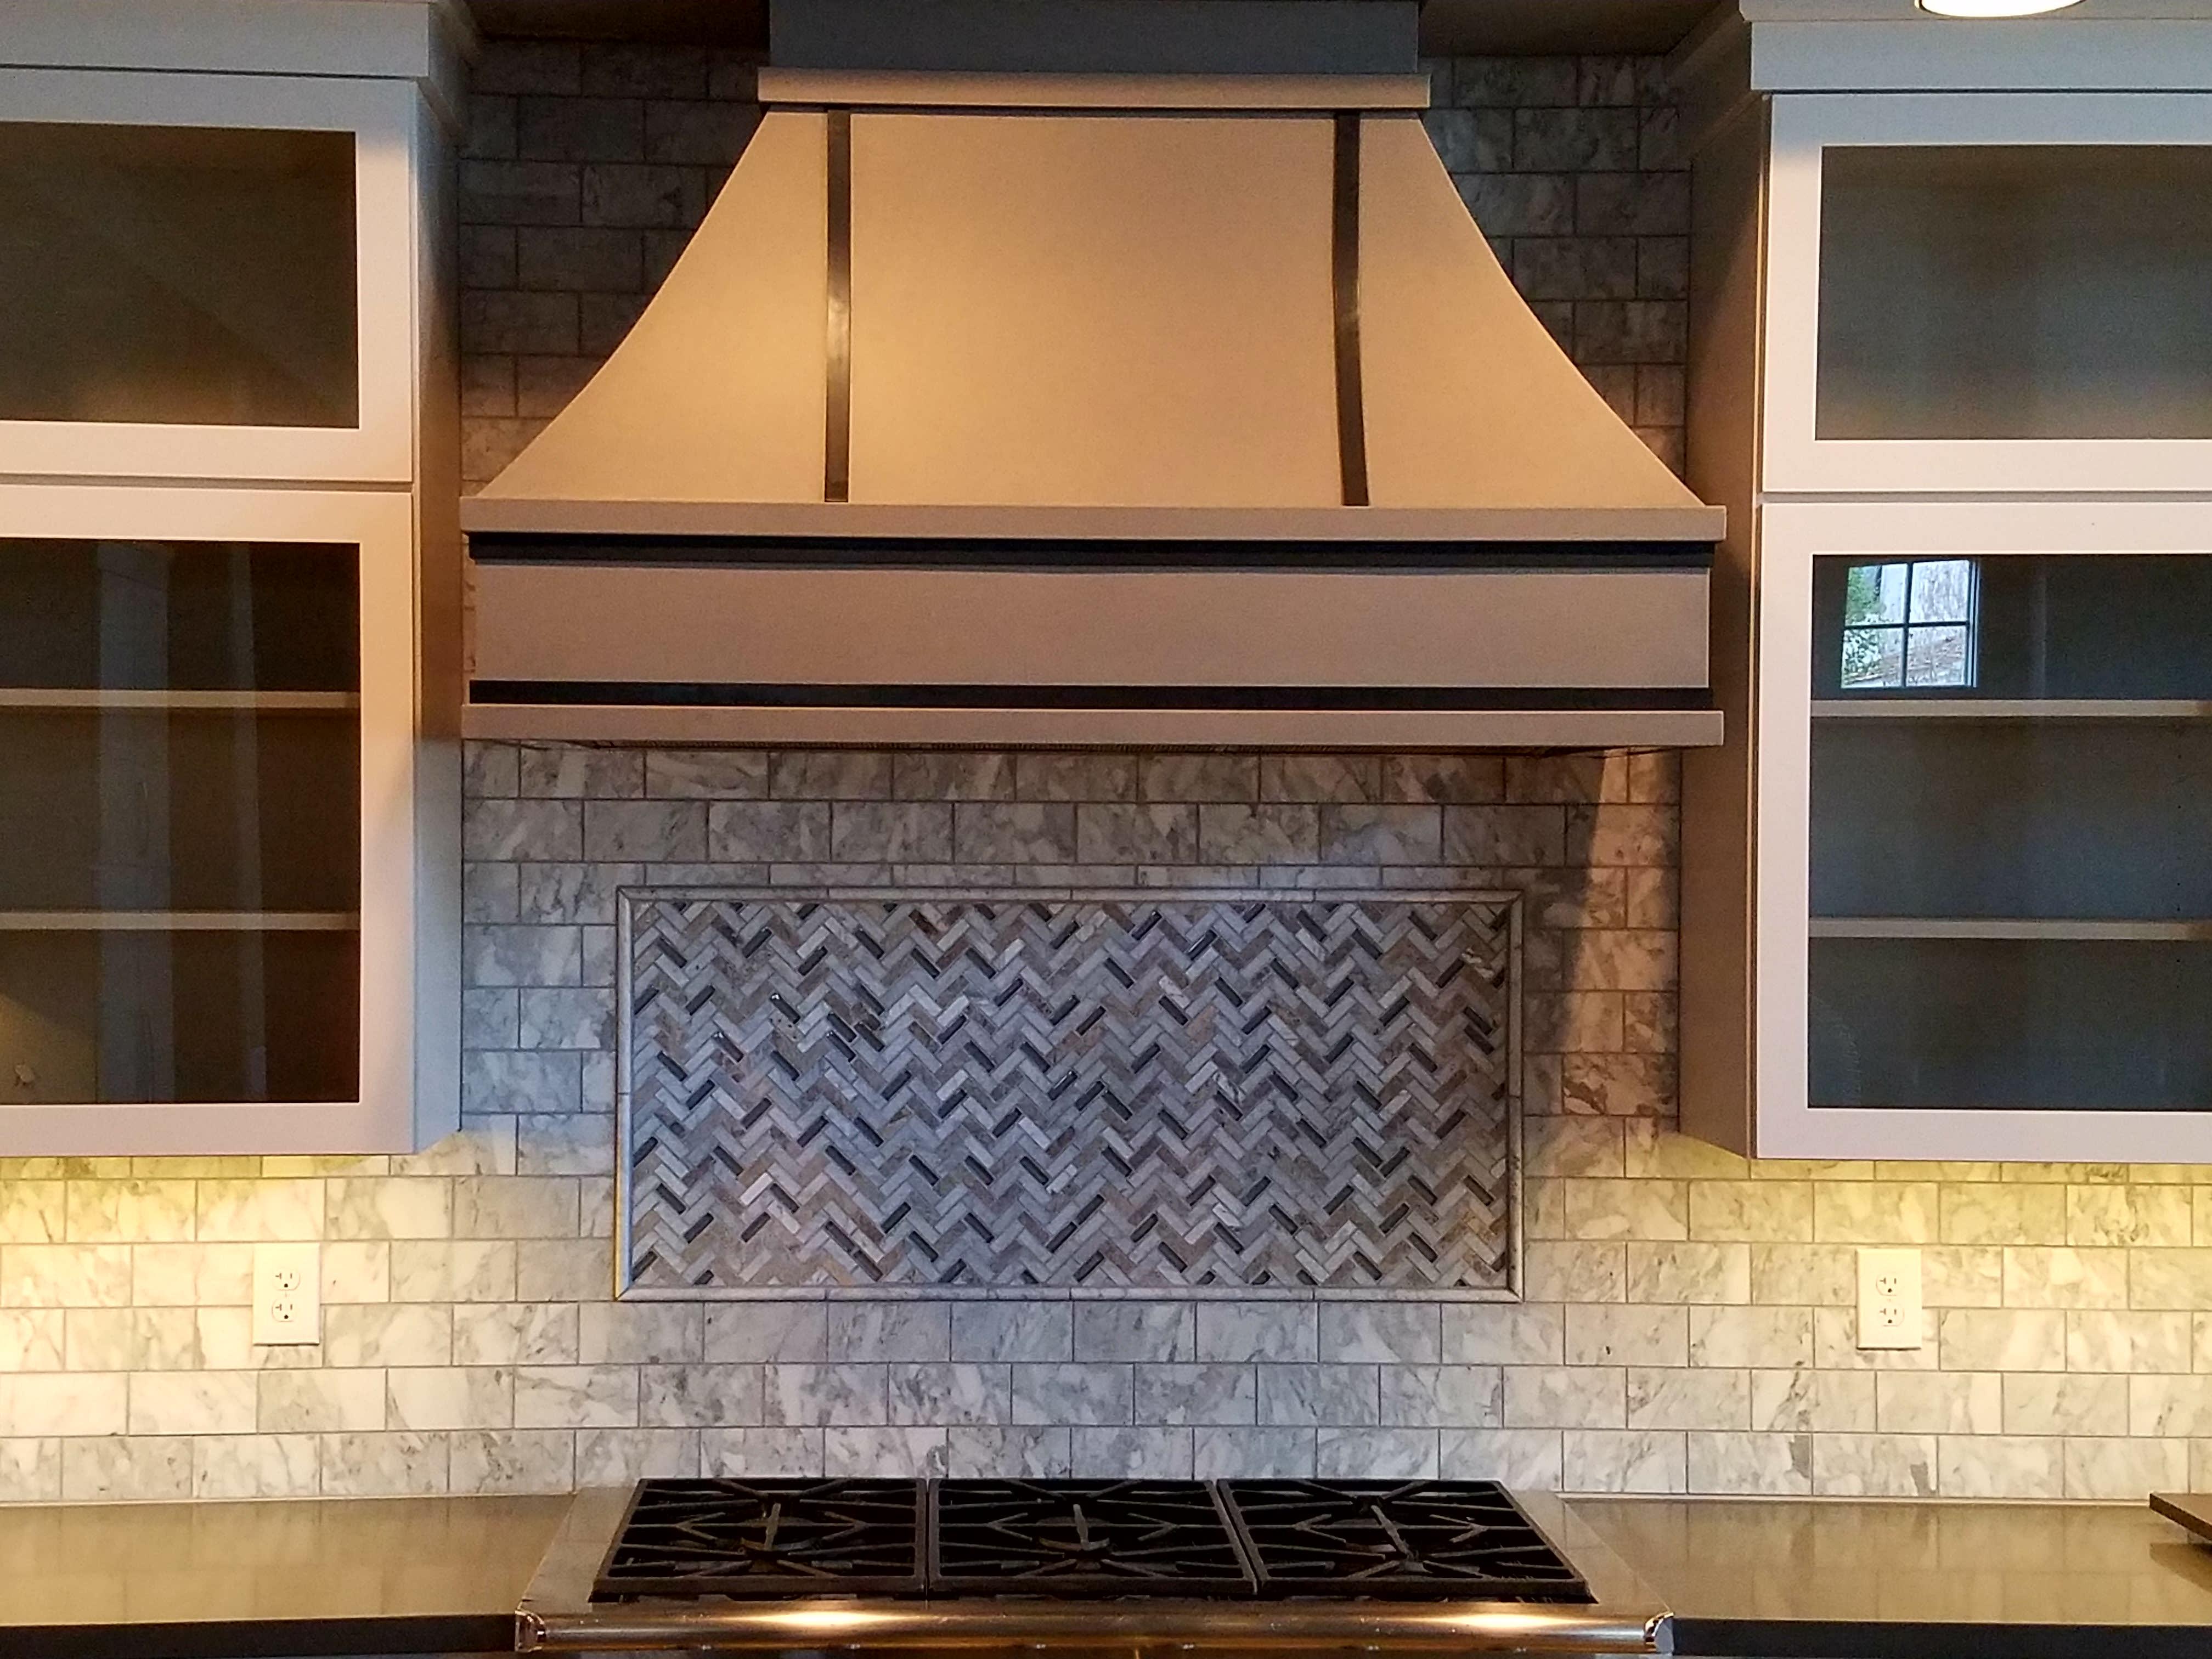 Kitchen Oven Hood